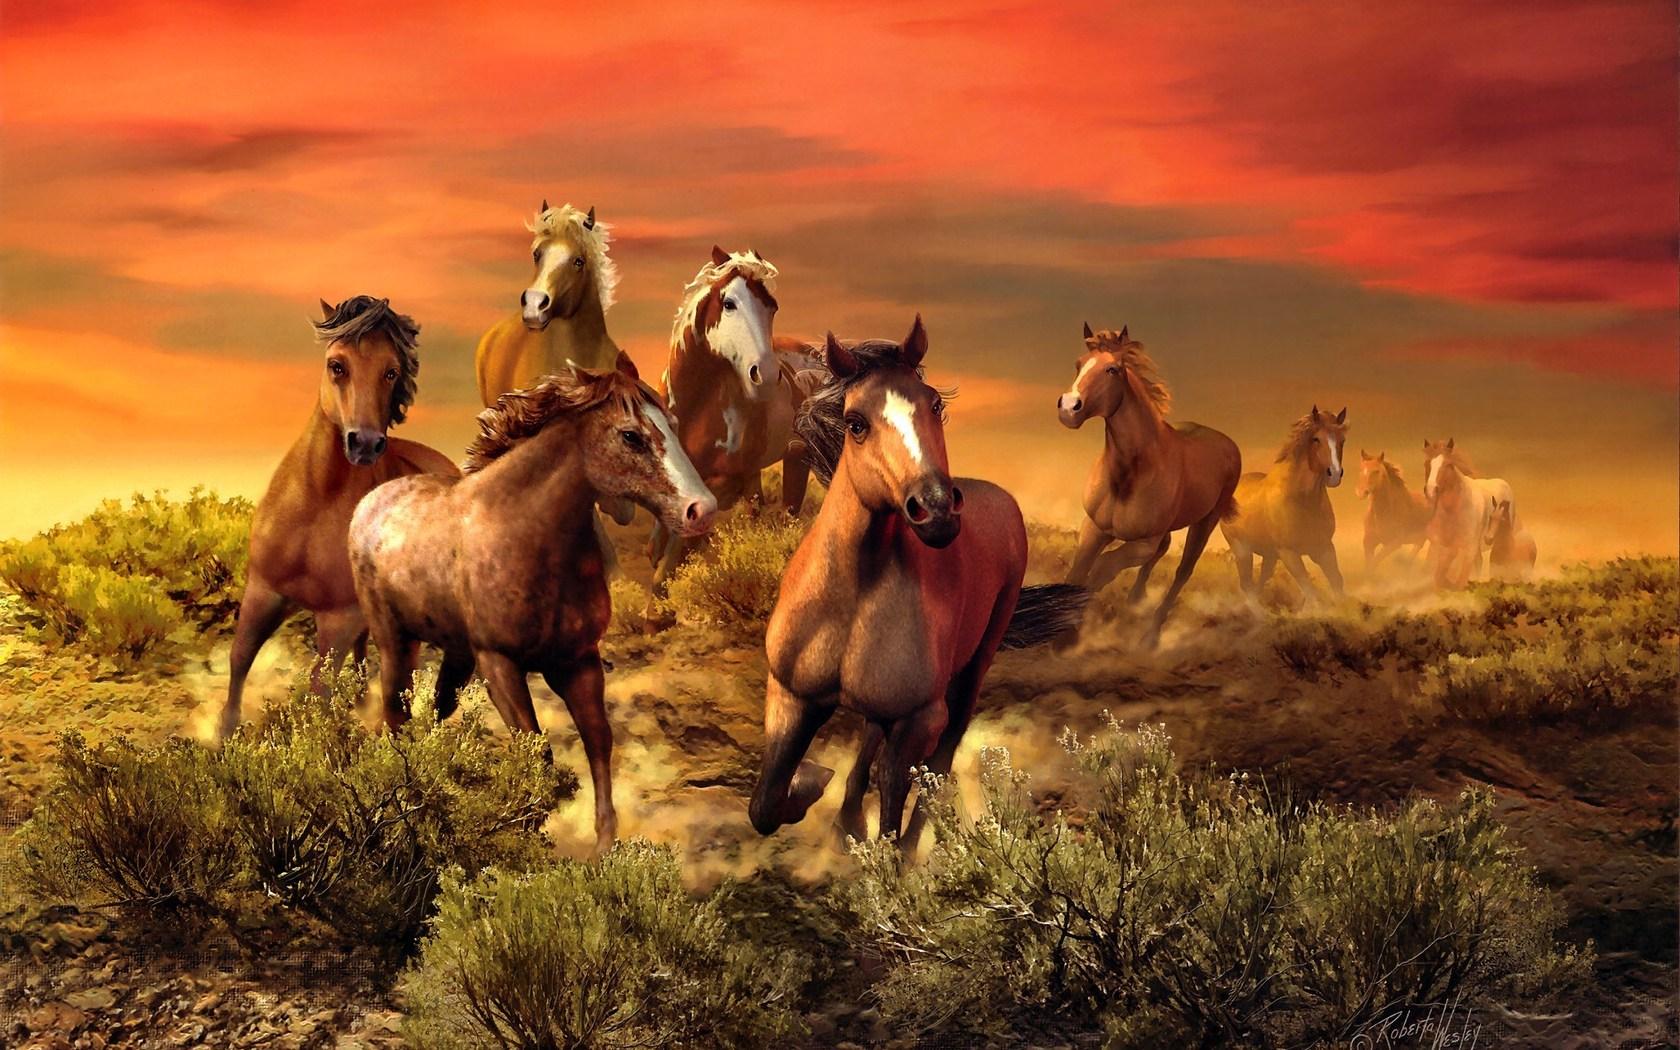 Fire horse wallpaper download - Free Horses Wallpapers For Windows Wallpapersafari